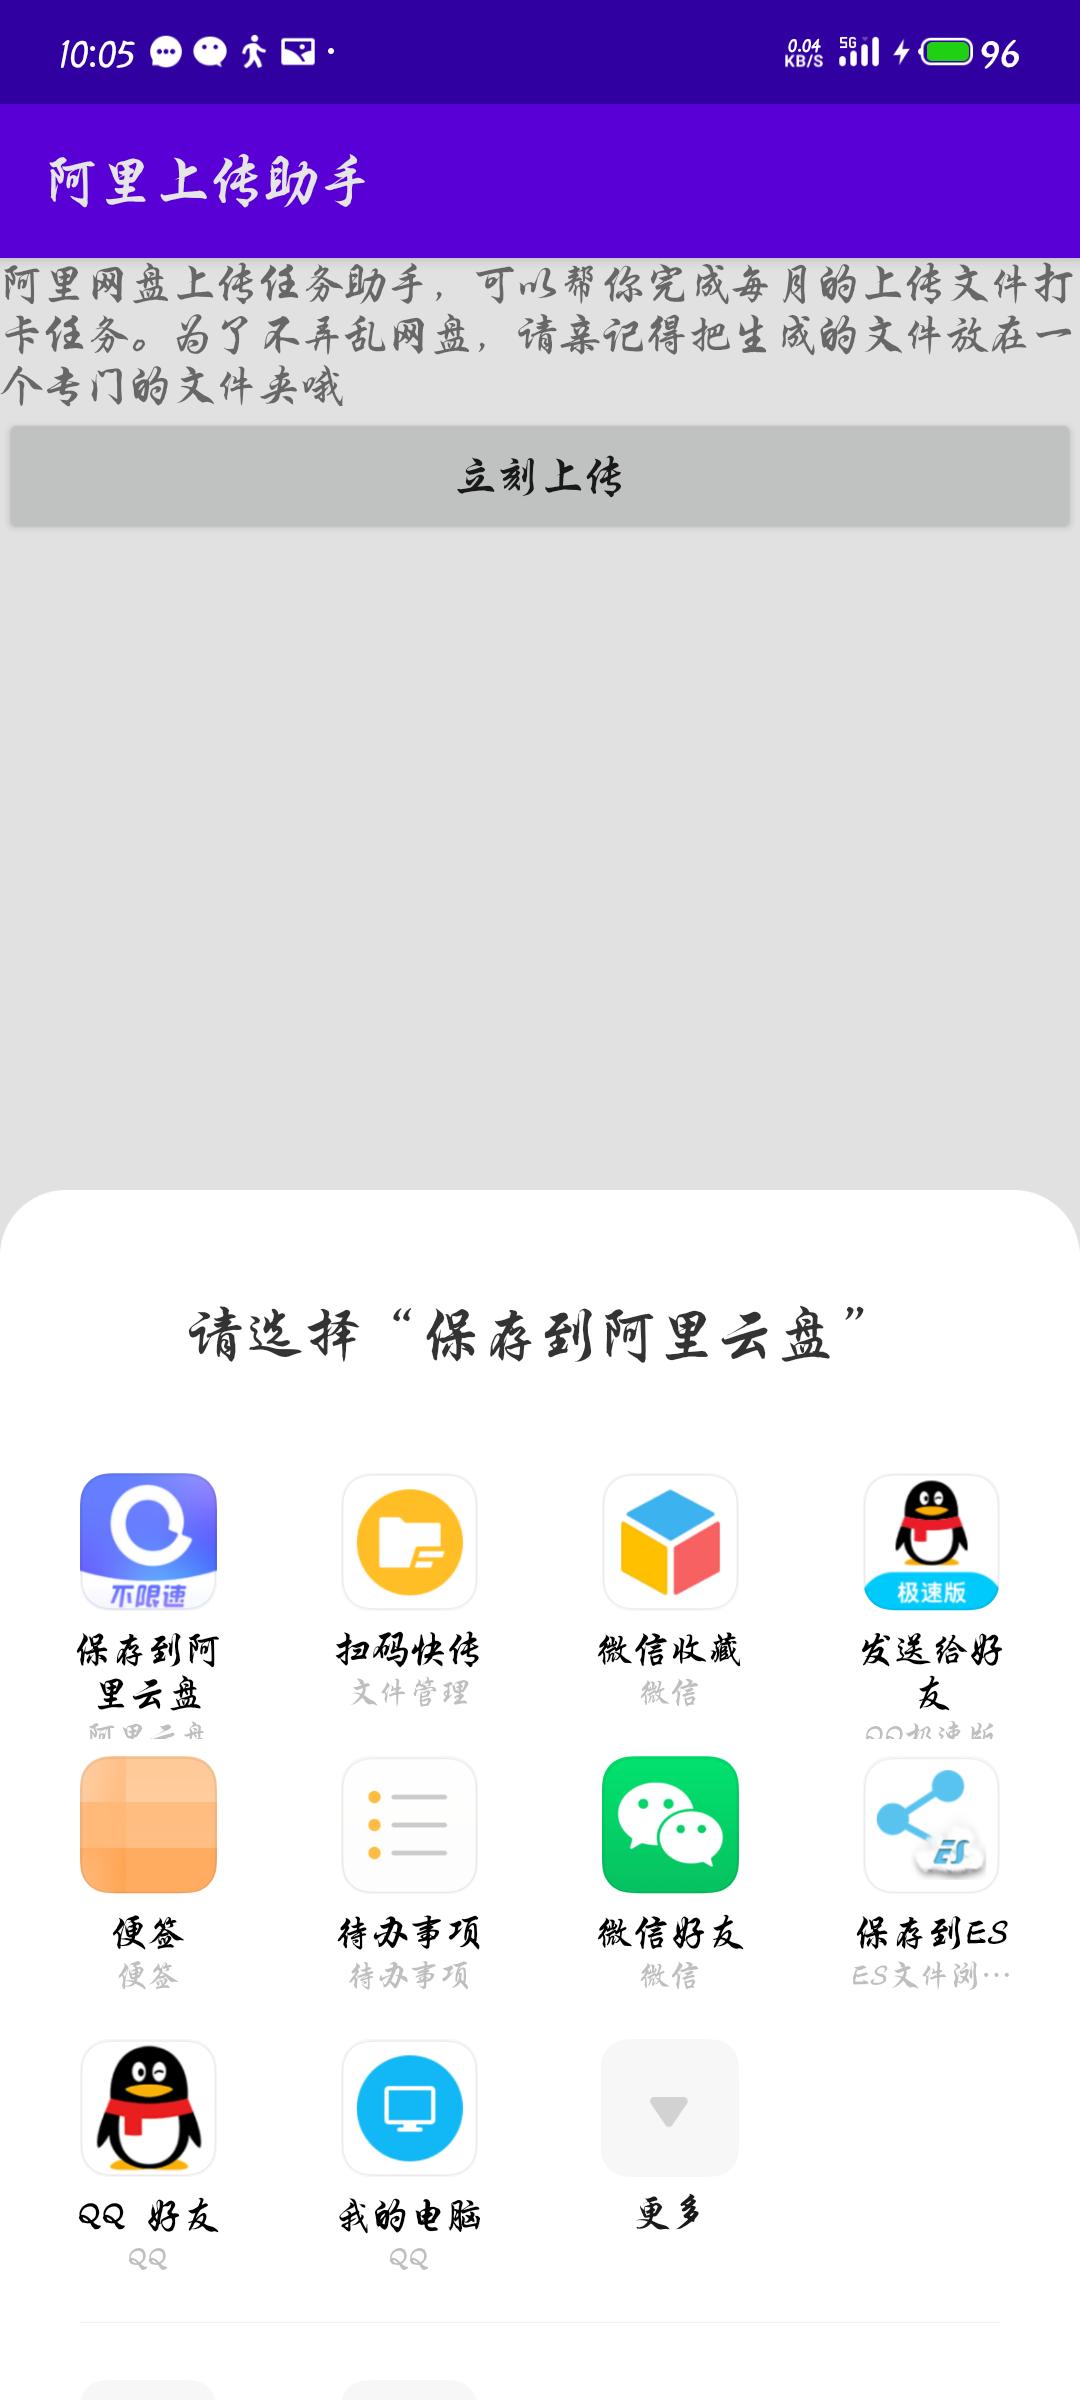 [Android工具] 阿里云盘上传任务(容量续命)助手